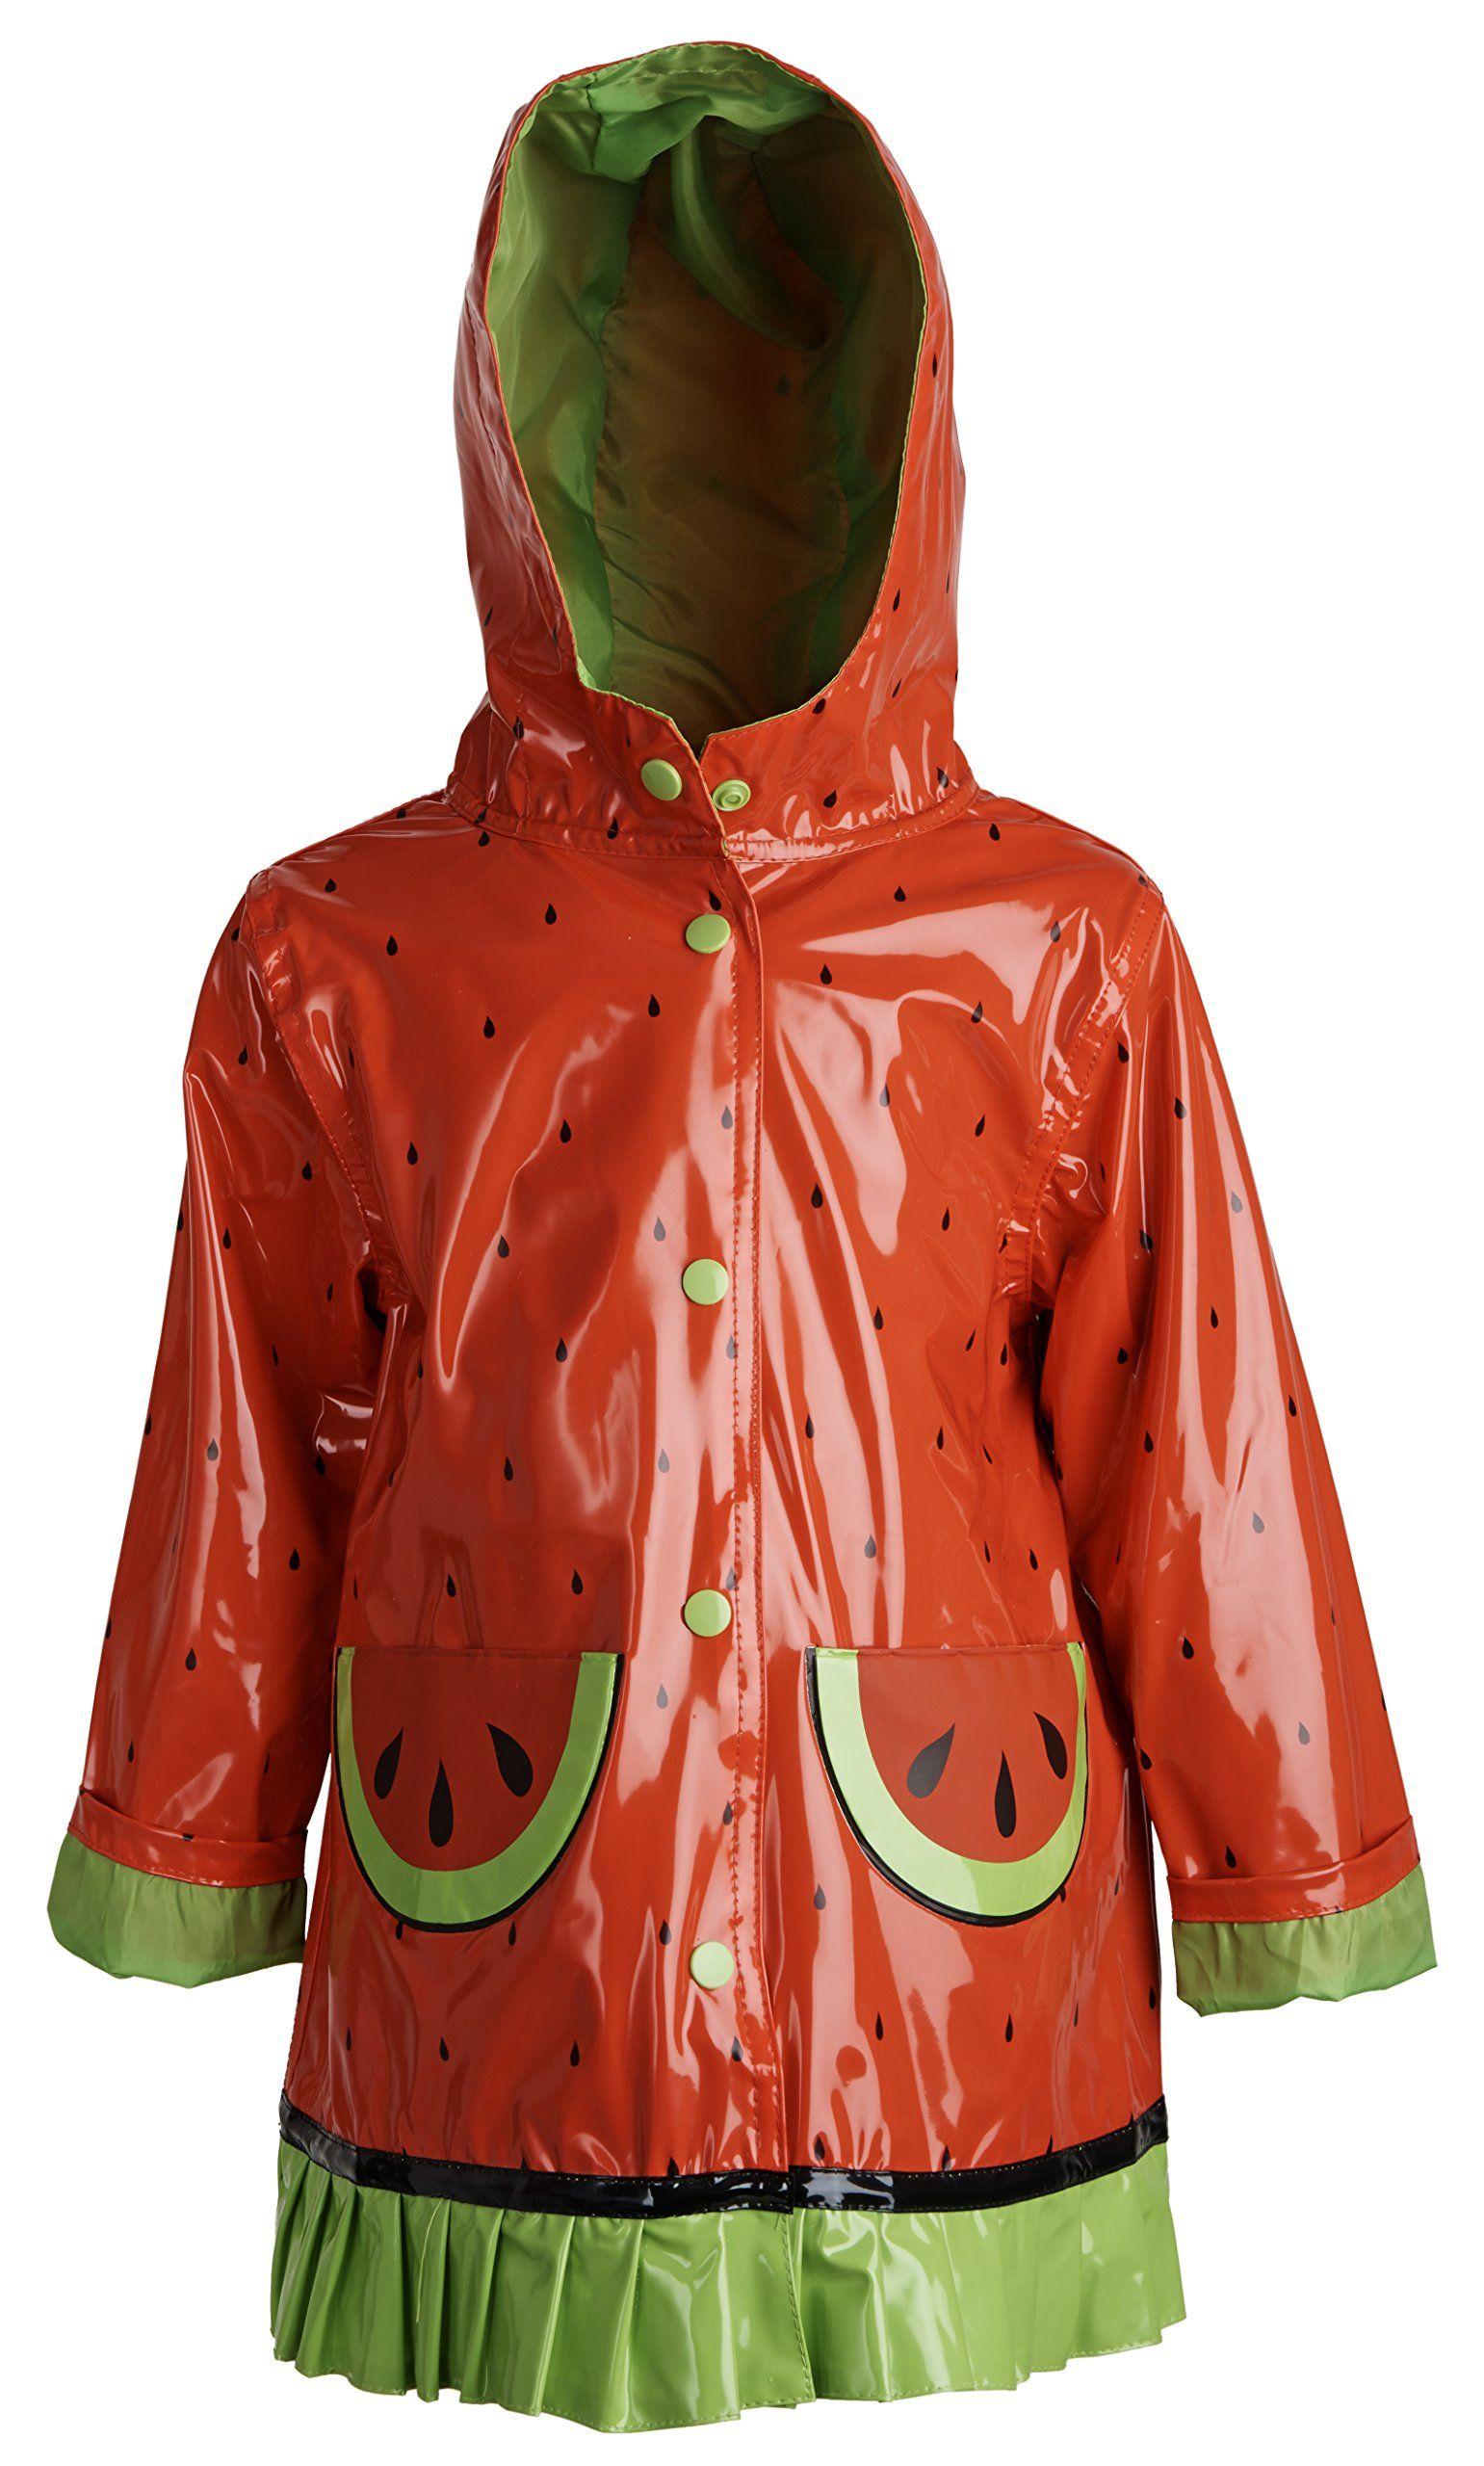 9f542fb5da Wippette Baby Girls Waterproof Vinyl Fully Lined Hooded Raincoat ...